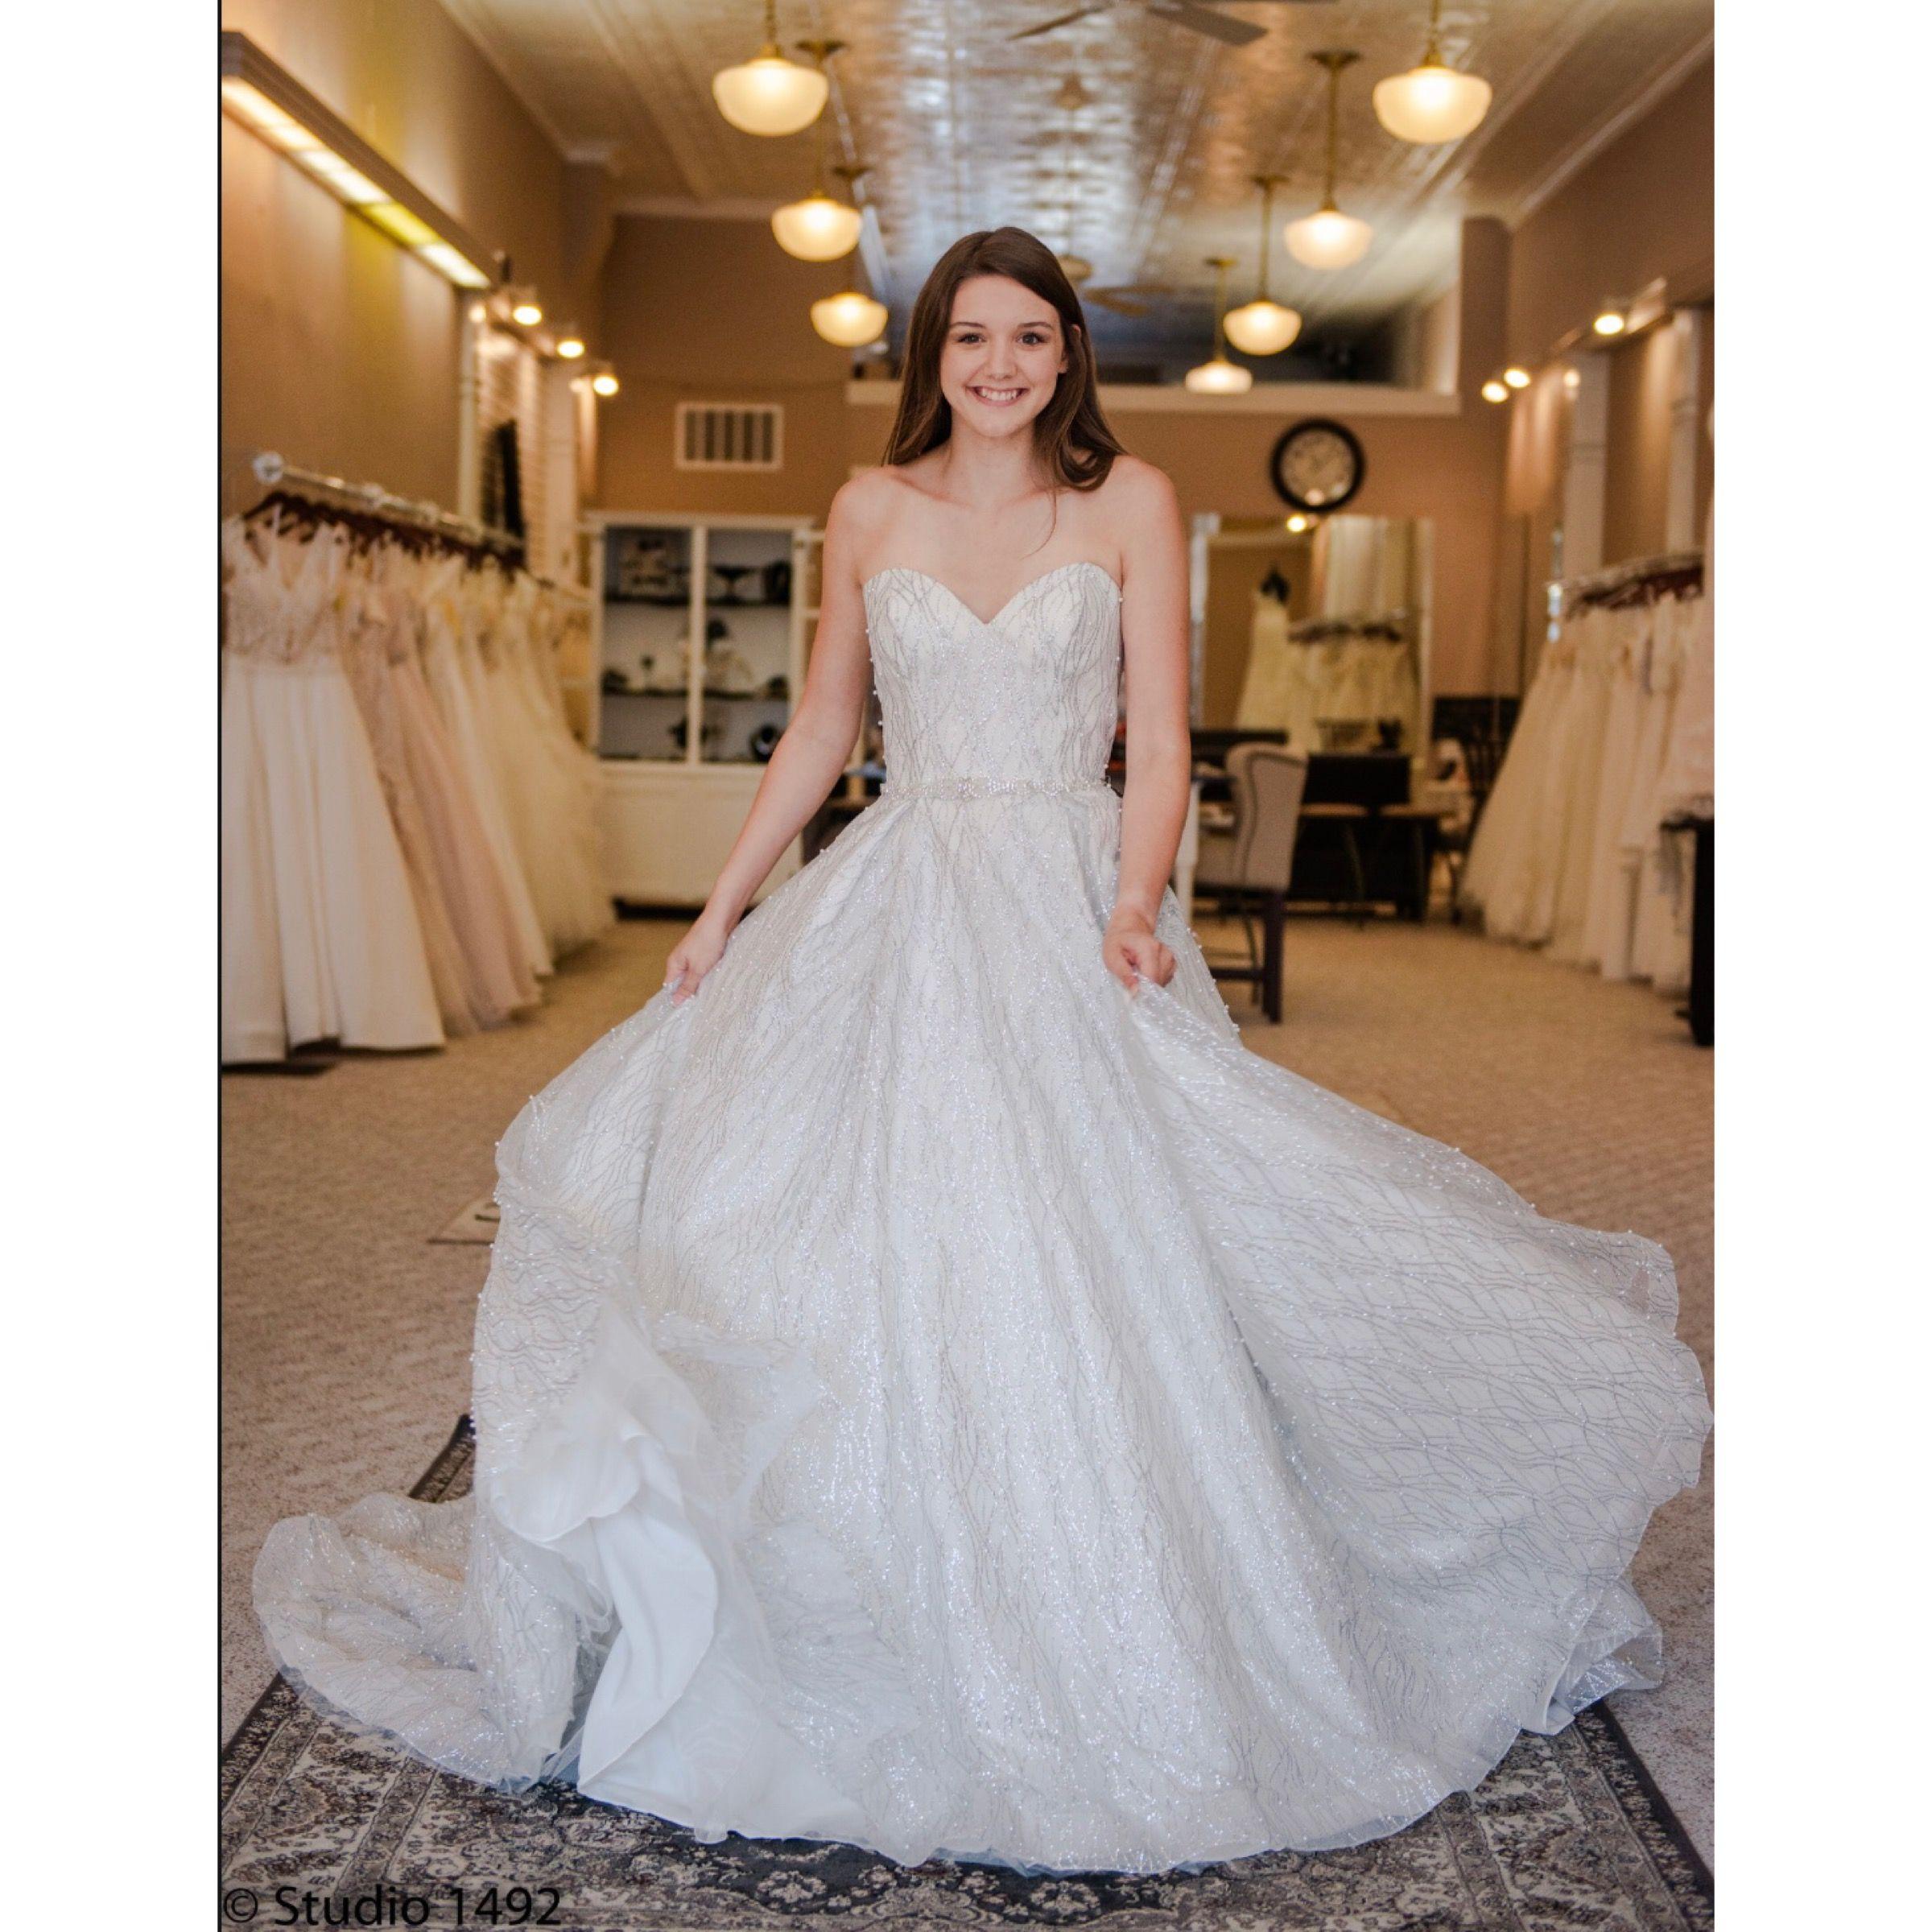 Mori Lee Ball Gown Wedding Dresses Lace Wedding Attire Wedding Dresses